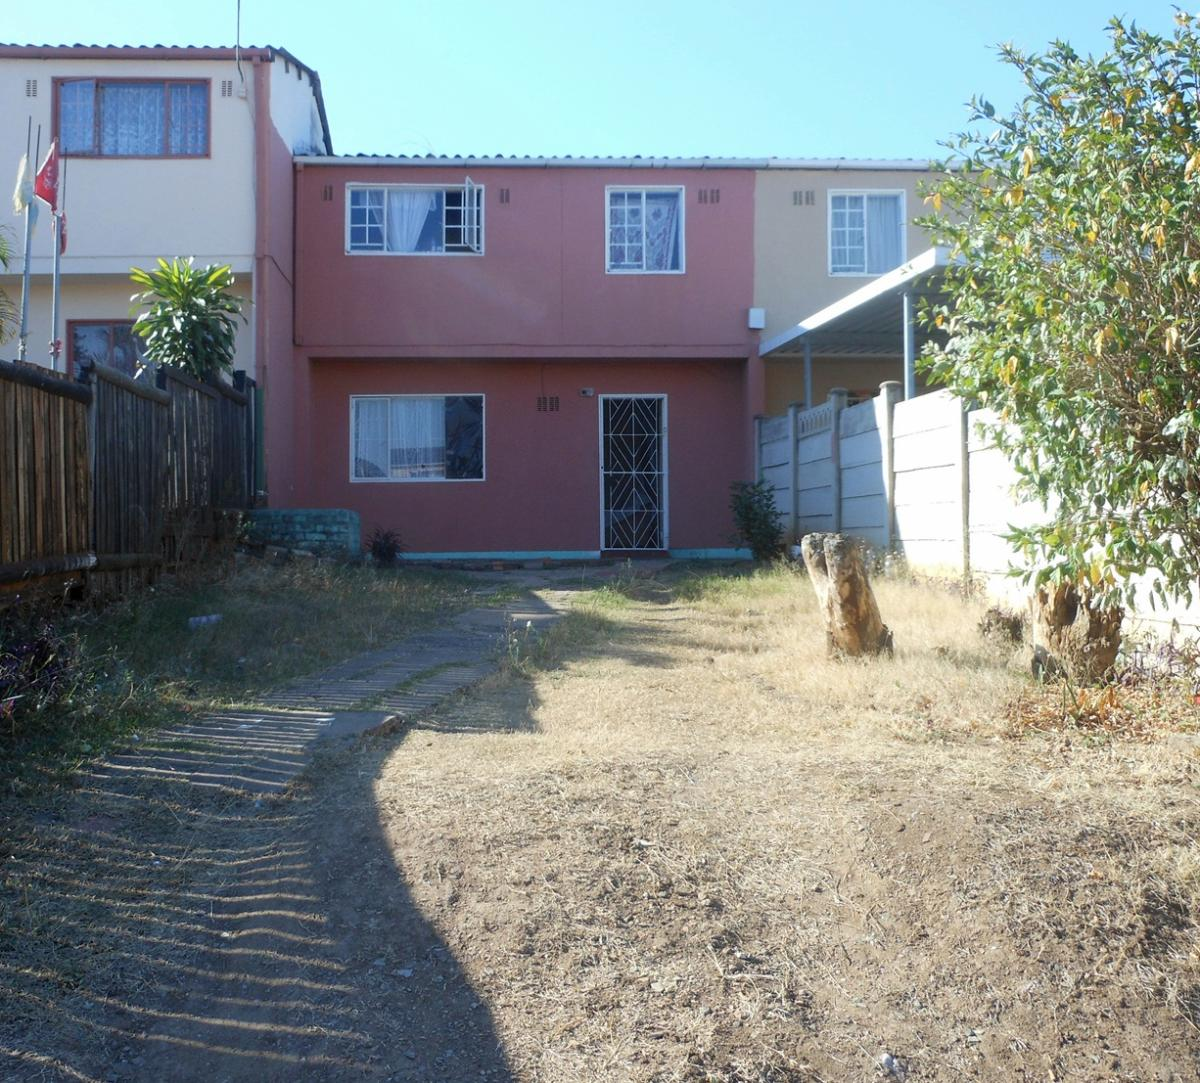 3 Bedroom duplex townhouse for sale in Whetstone